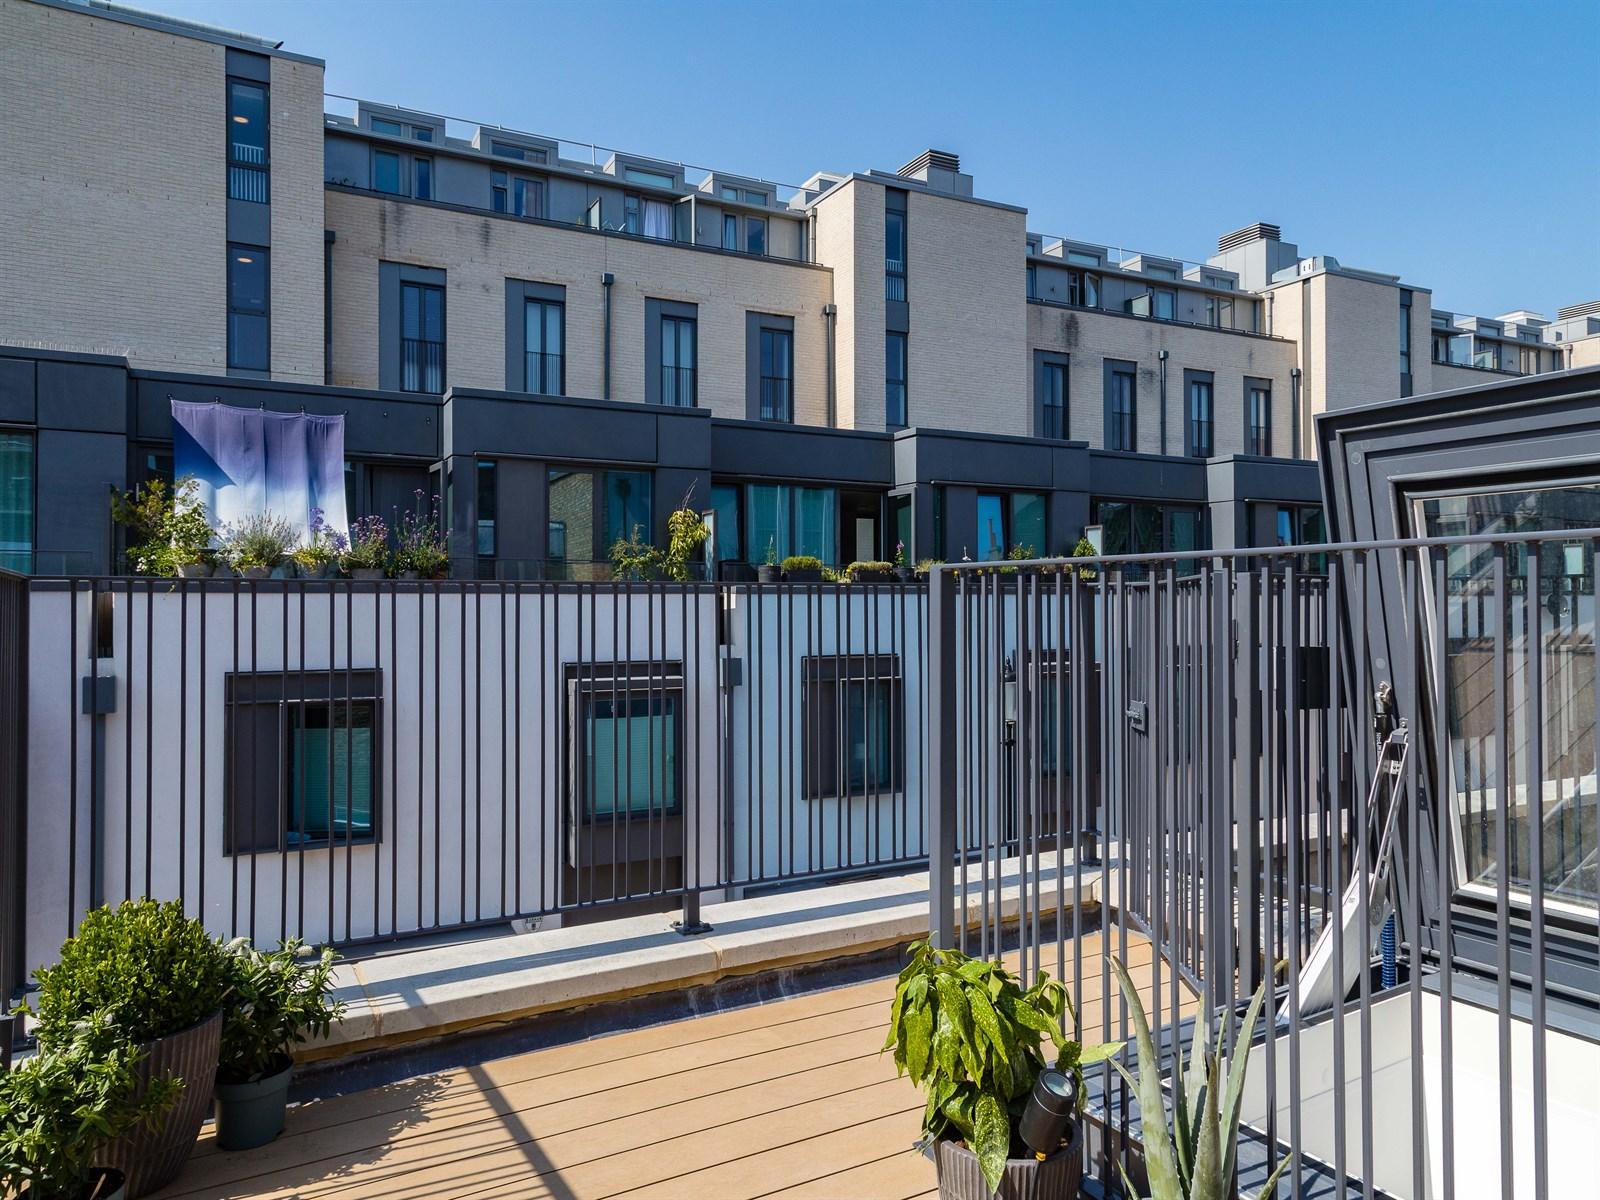 2 bedroom North Kensington flat for sale - Munro Mews, W10